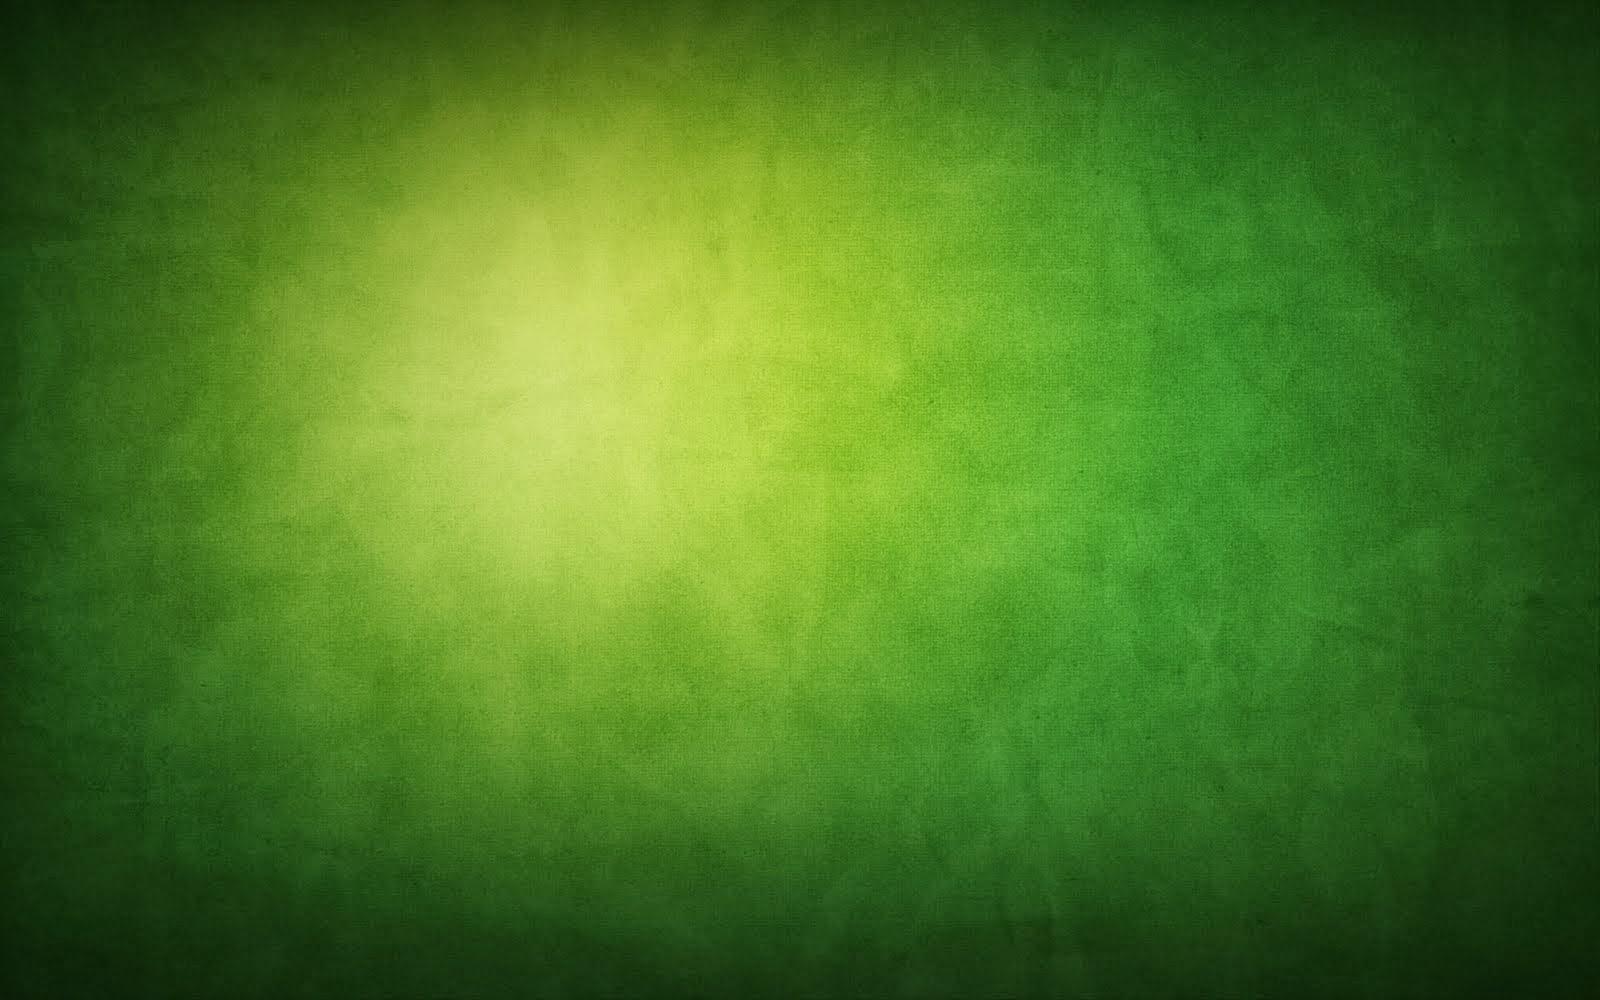 Green Wallpaper For Walls Green wallpaper 1600x1000